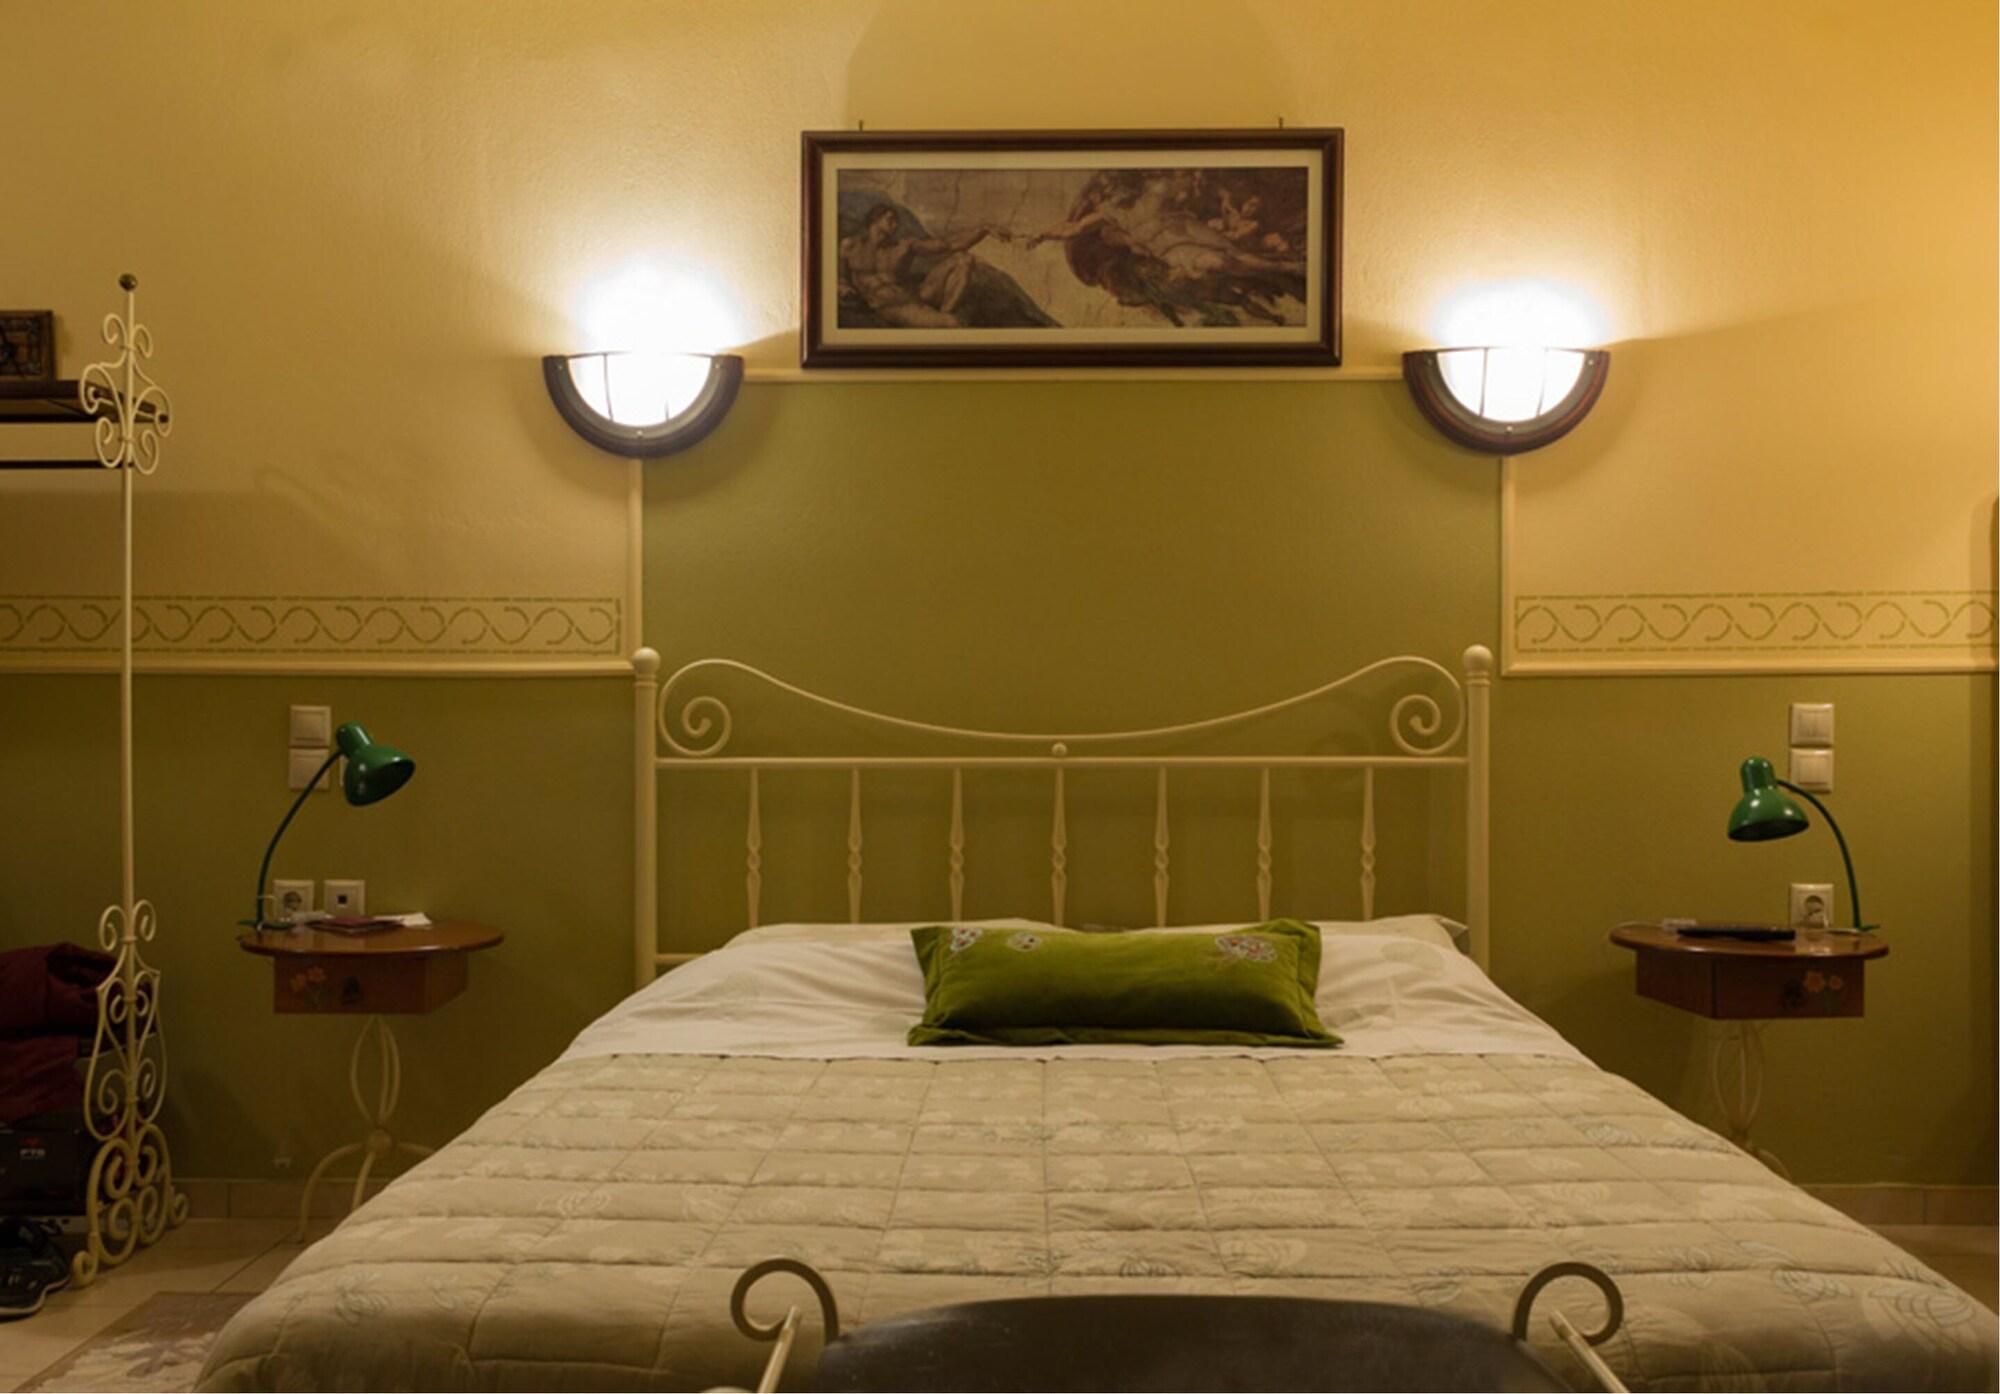 Akrolimnion Hotel, Epirus